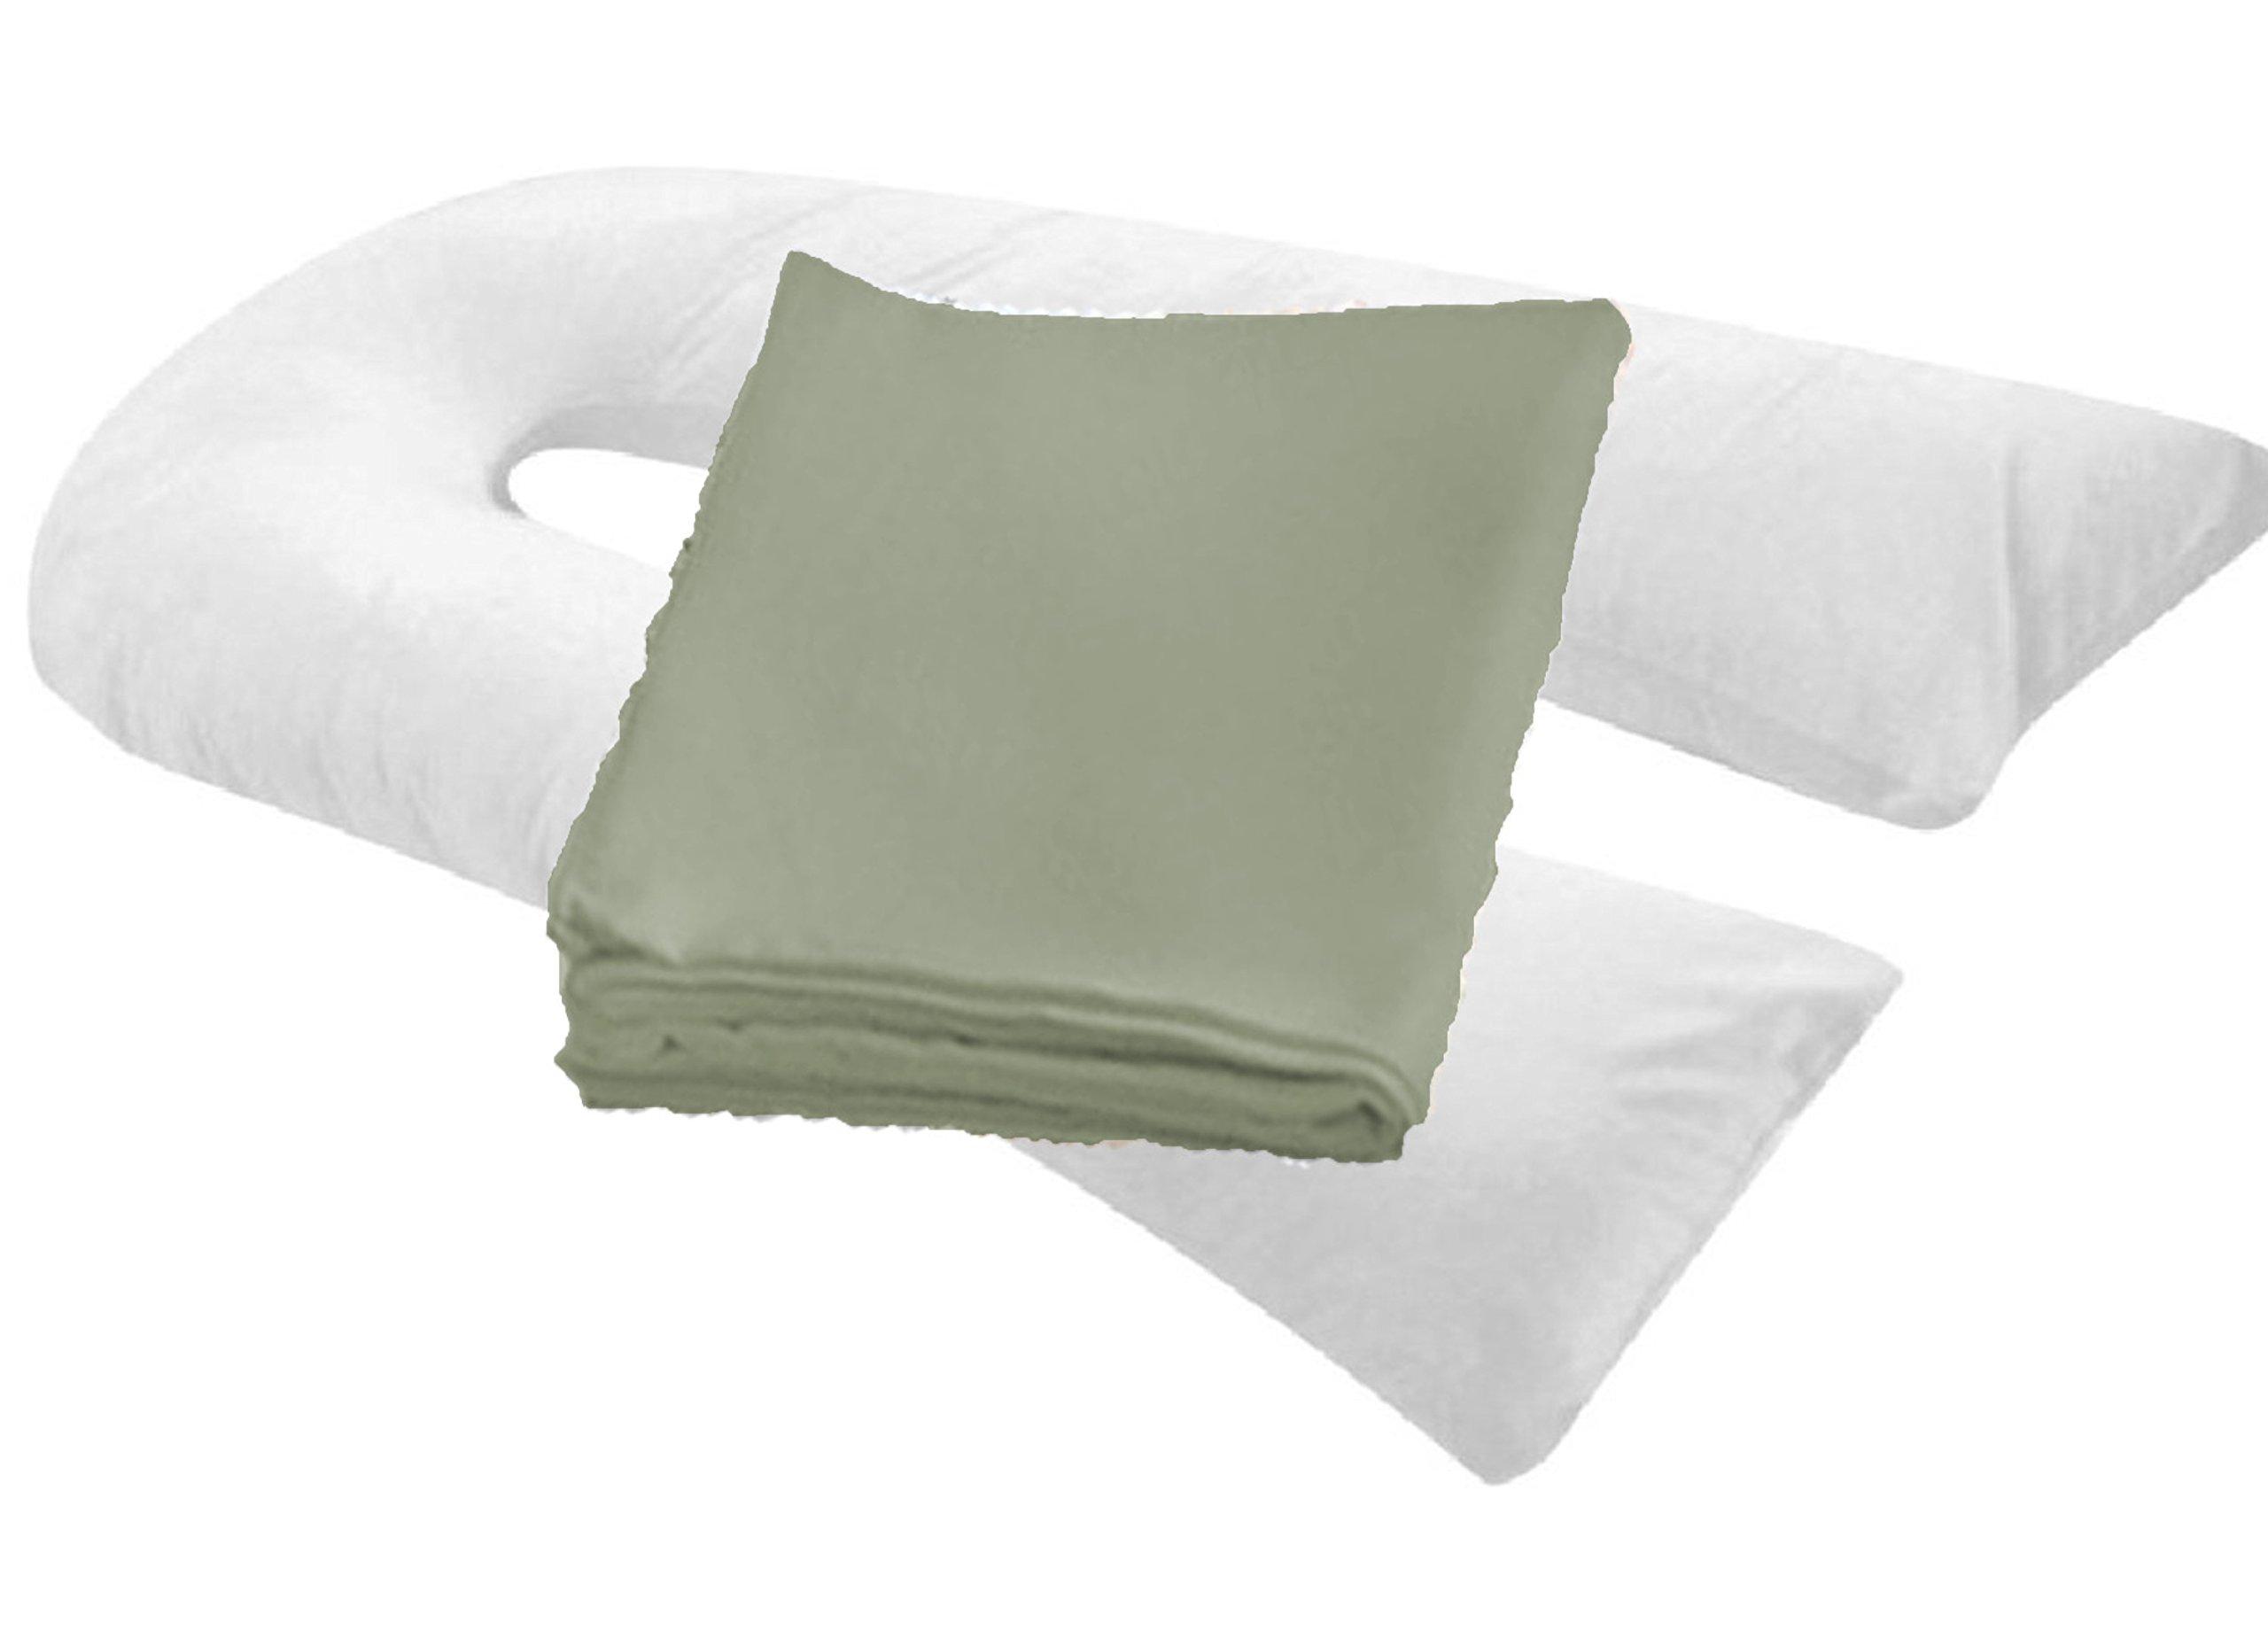 "20"" X 130"" Oversized Body Pillowcase/cover - Zipper End ( GRAY )"